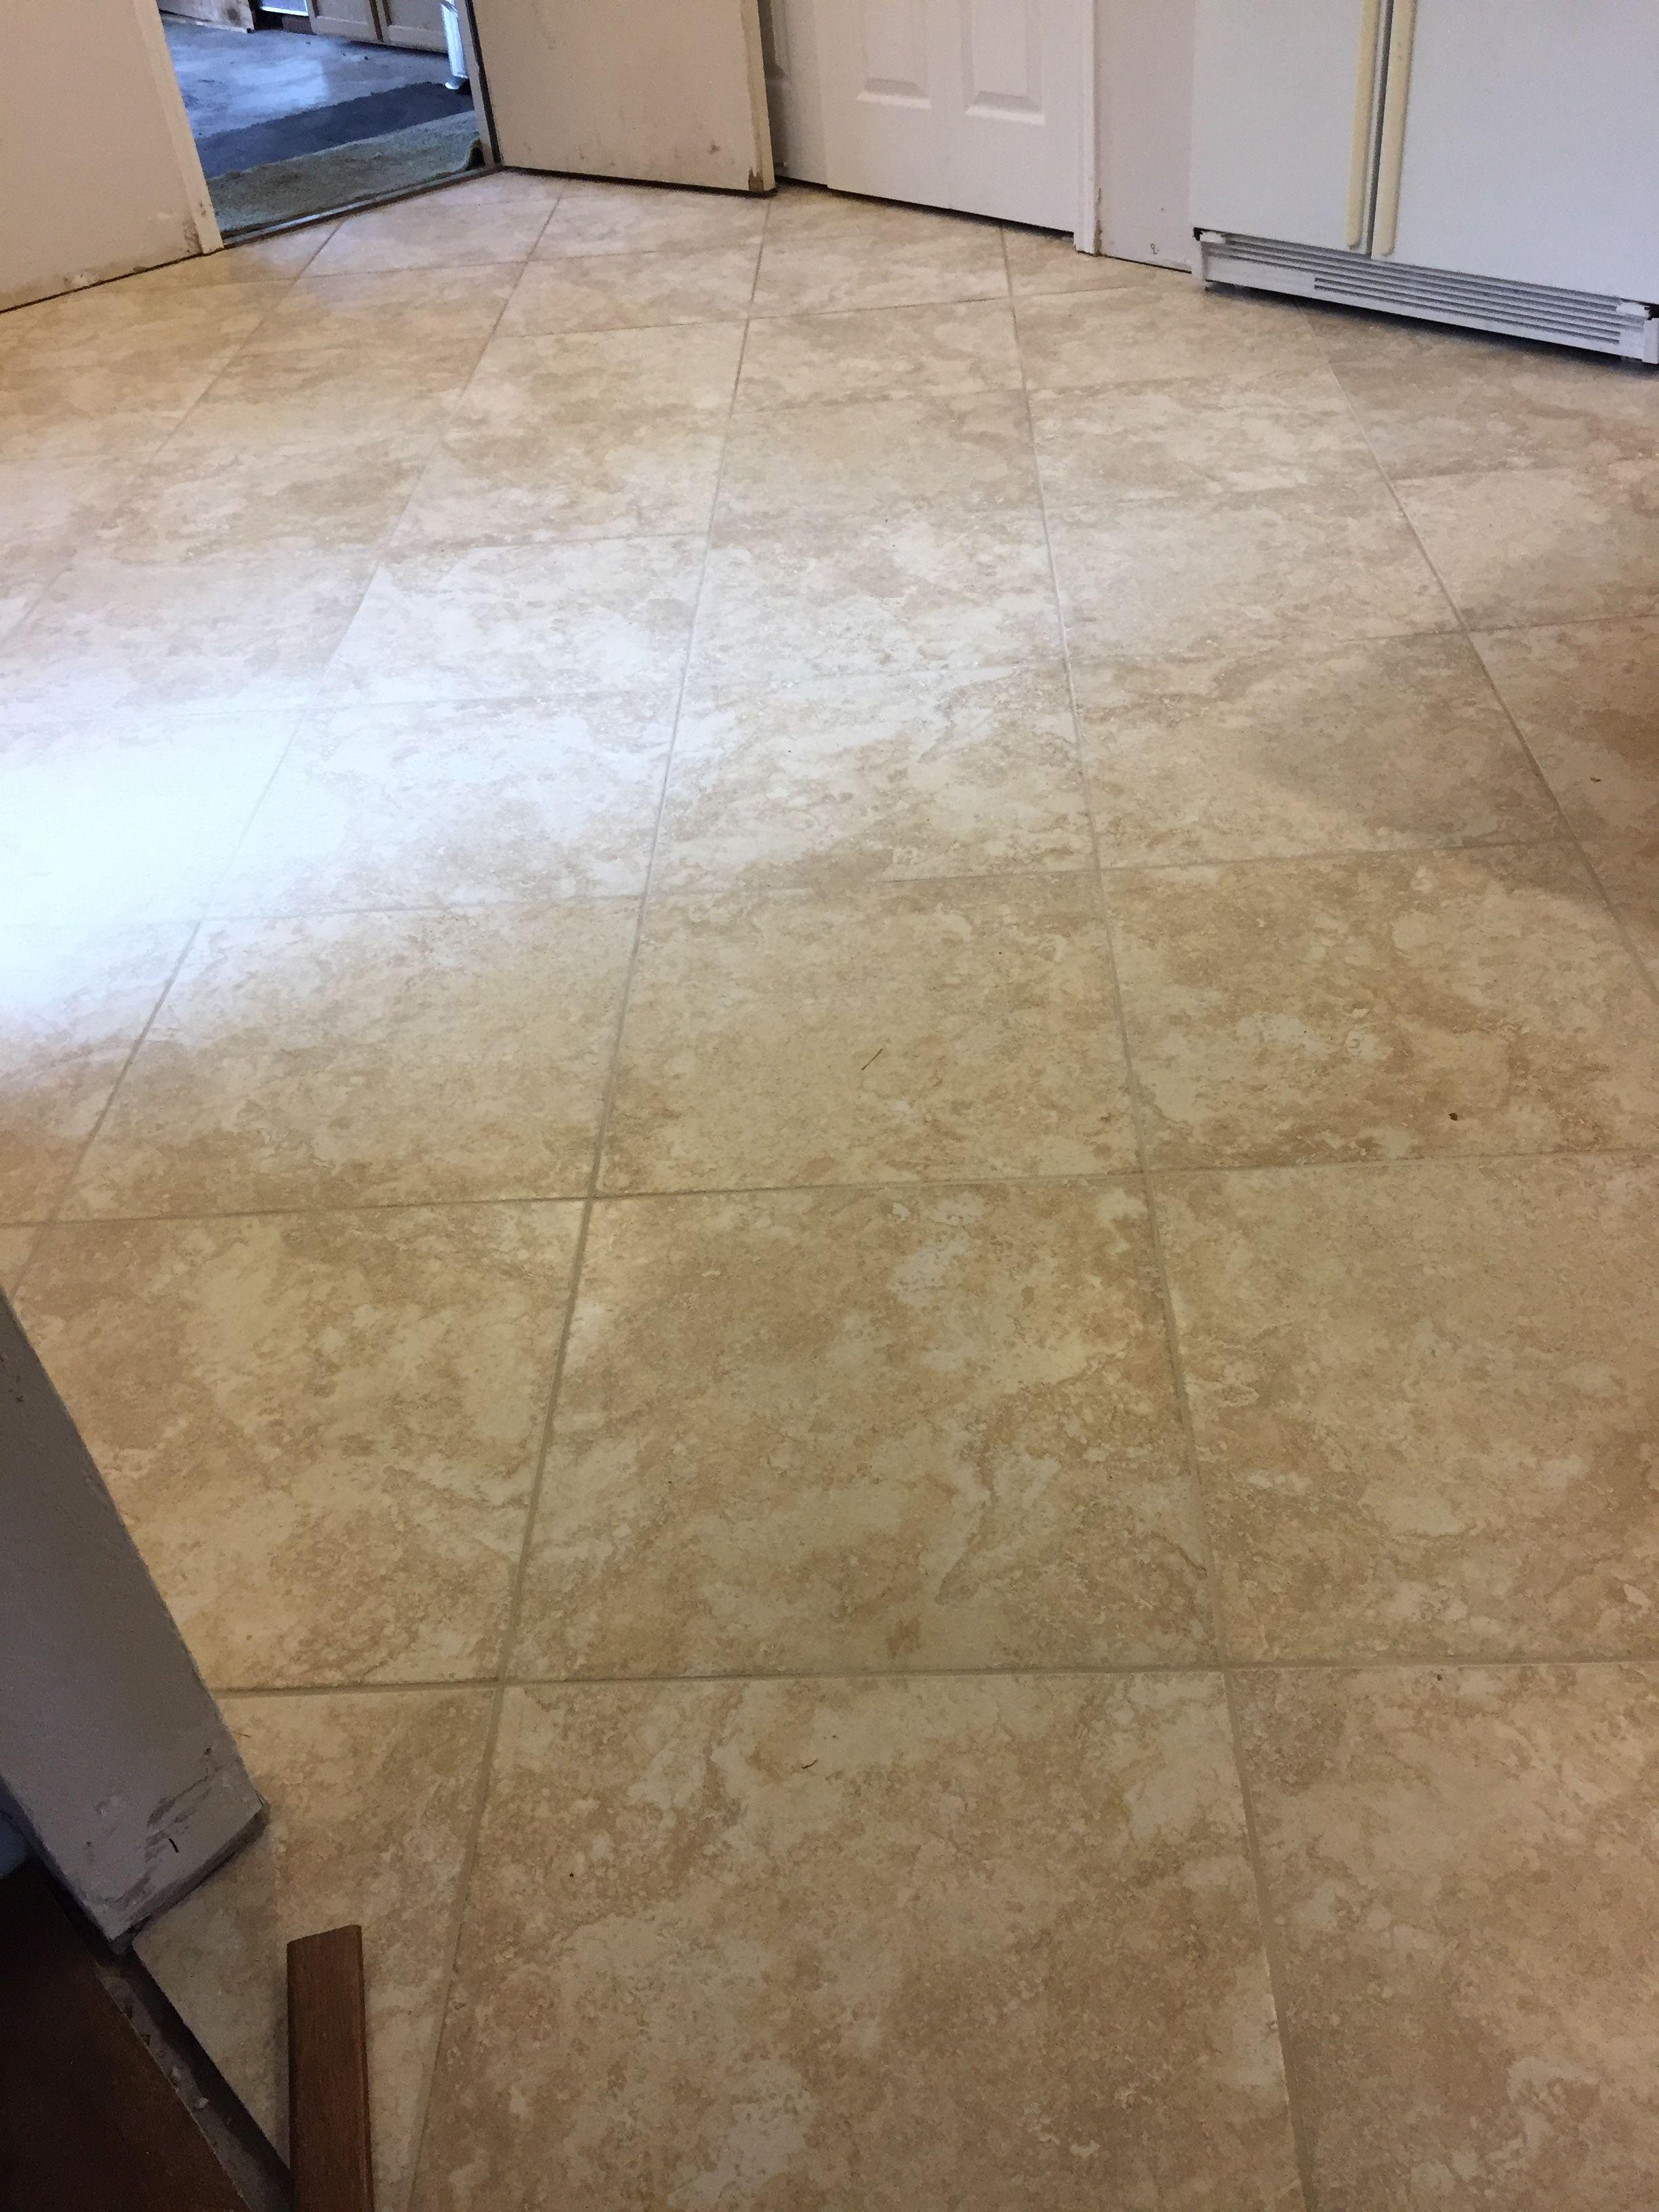 20x20 Laid On The Diagonal Lay Stone Flooring Flooring Tiles